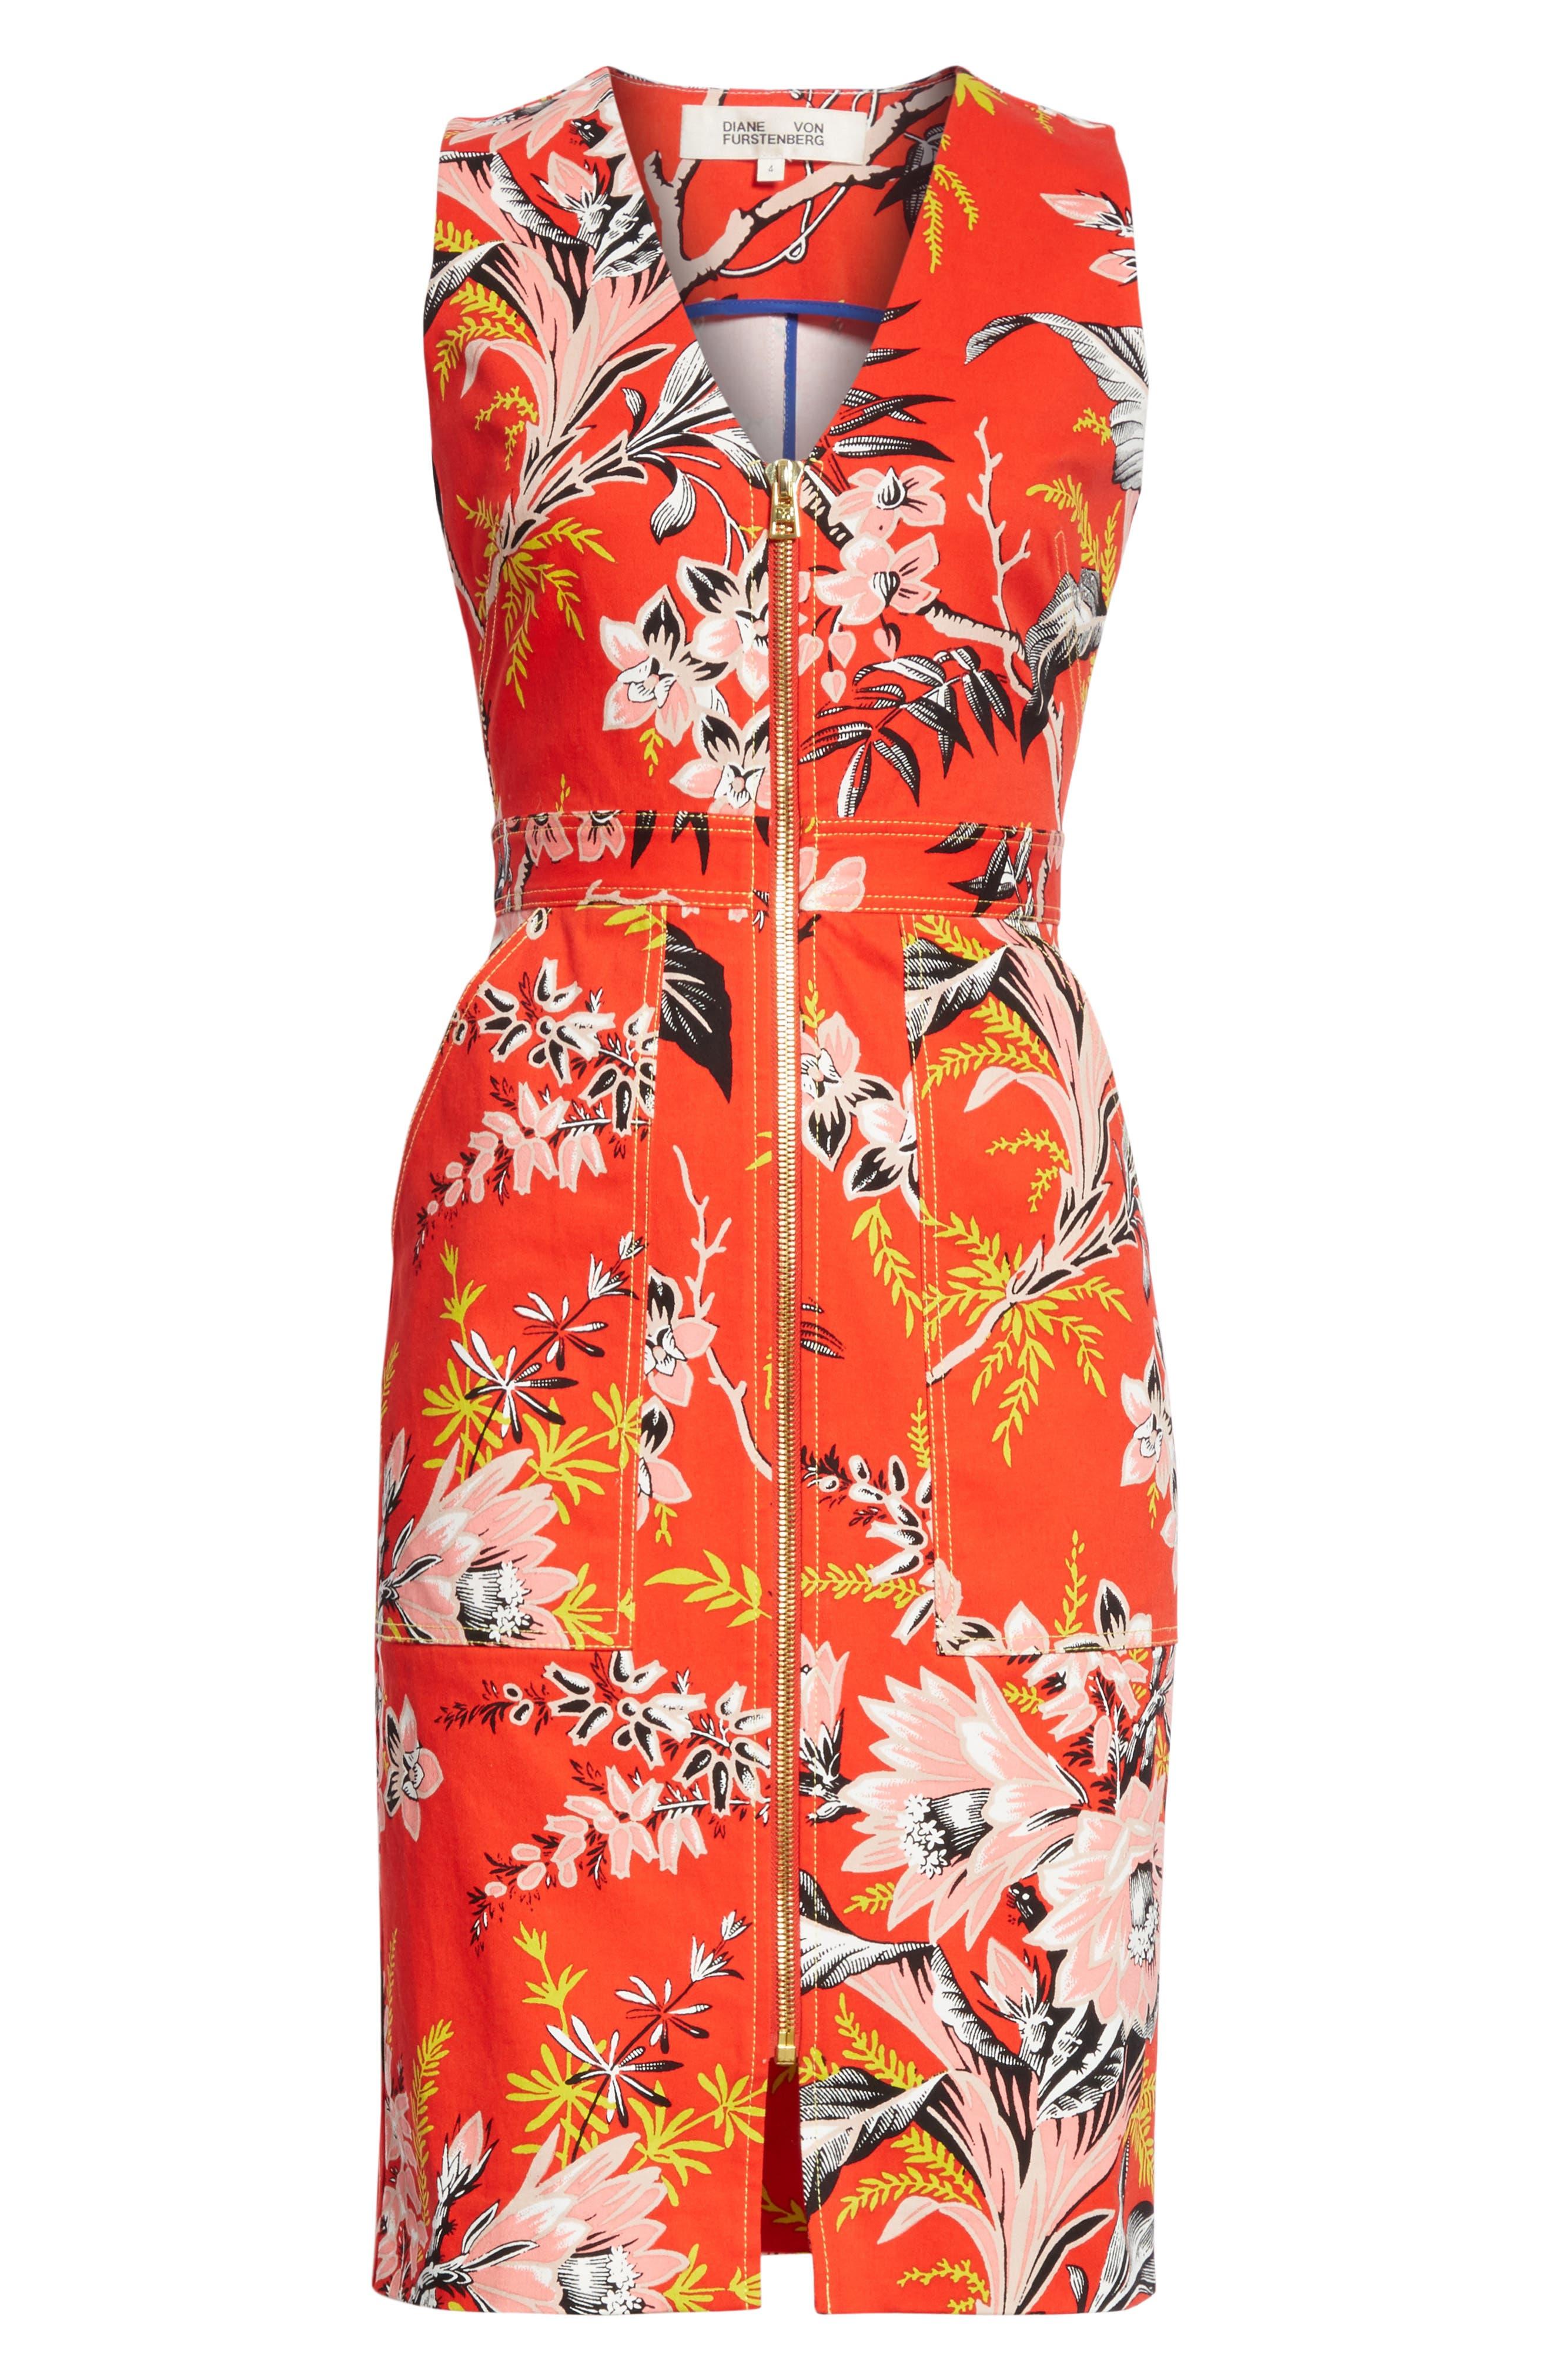 Diane von Furstenberg Floral Zip Front Stretch Cotton Sheath Dress,                             Alternate thumbnail 6, color,                             603